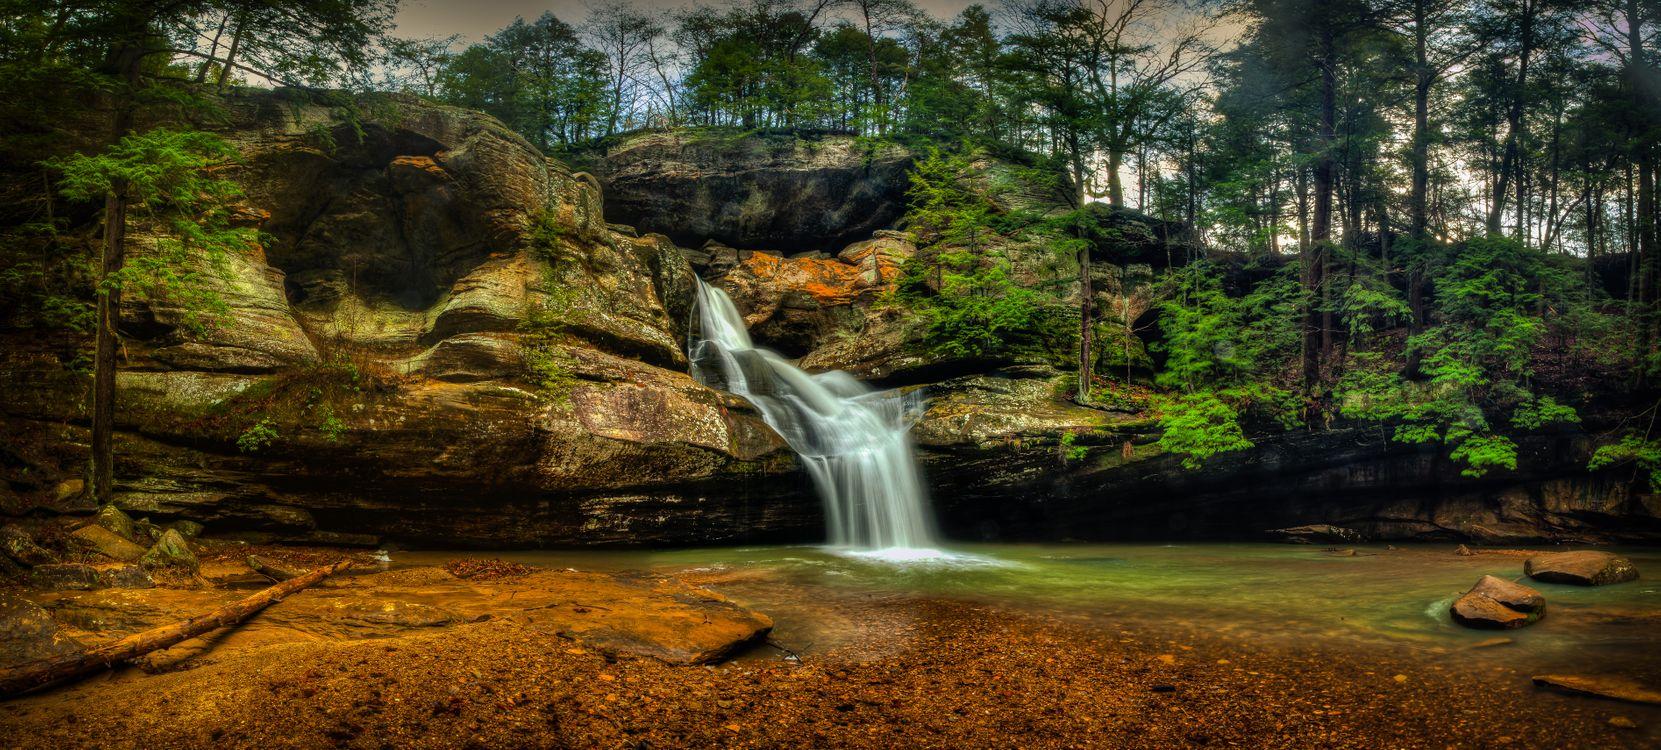 Фото бесплатно Hocking Hills State Park, ohio waterfallsЮводопад, скалы, водоём, деревья, природа, панорама, природа